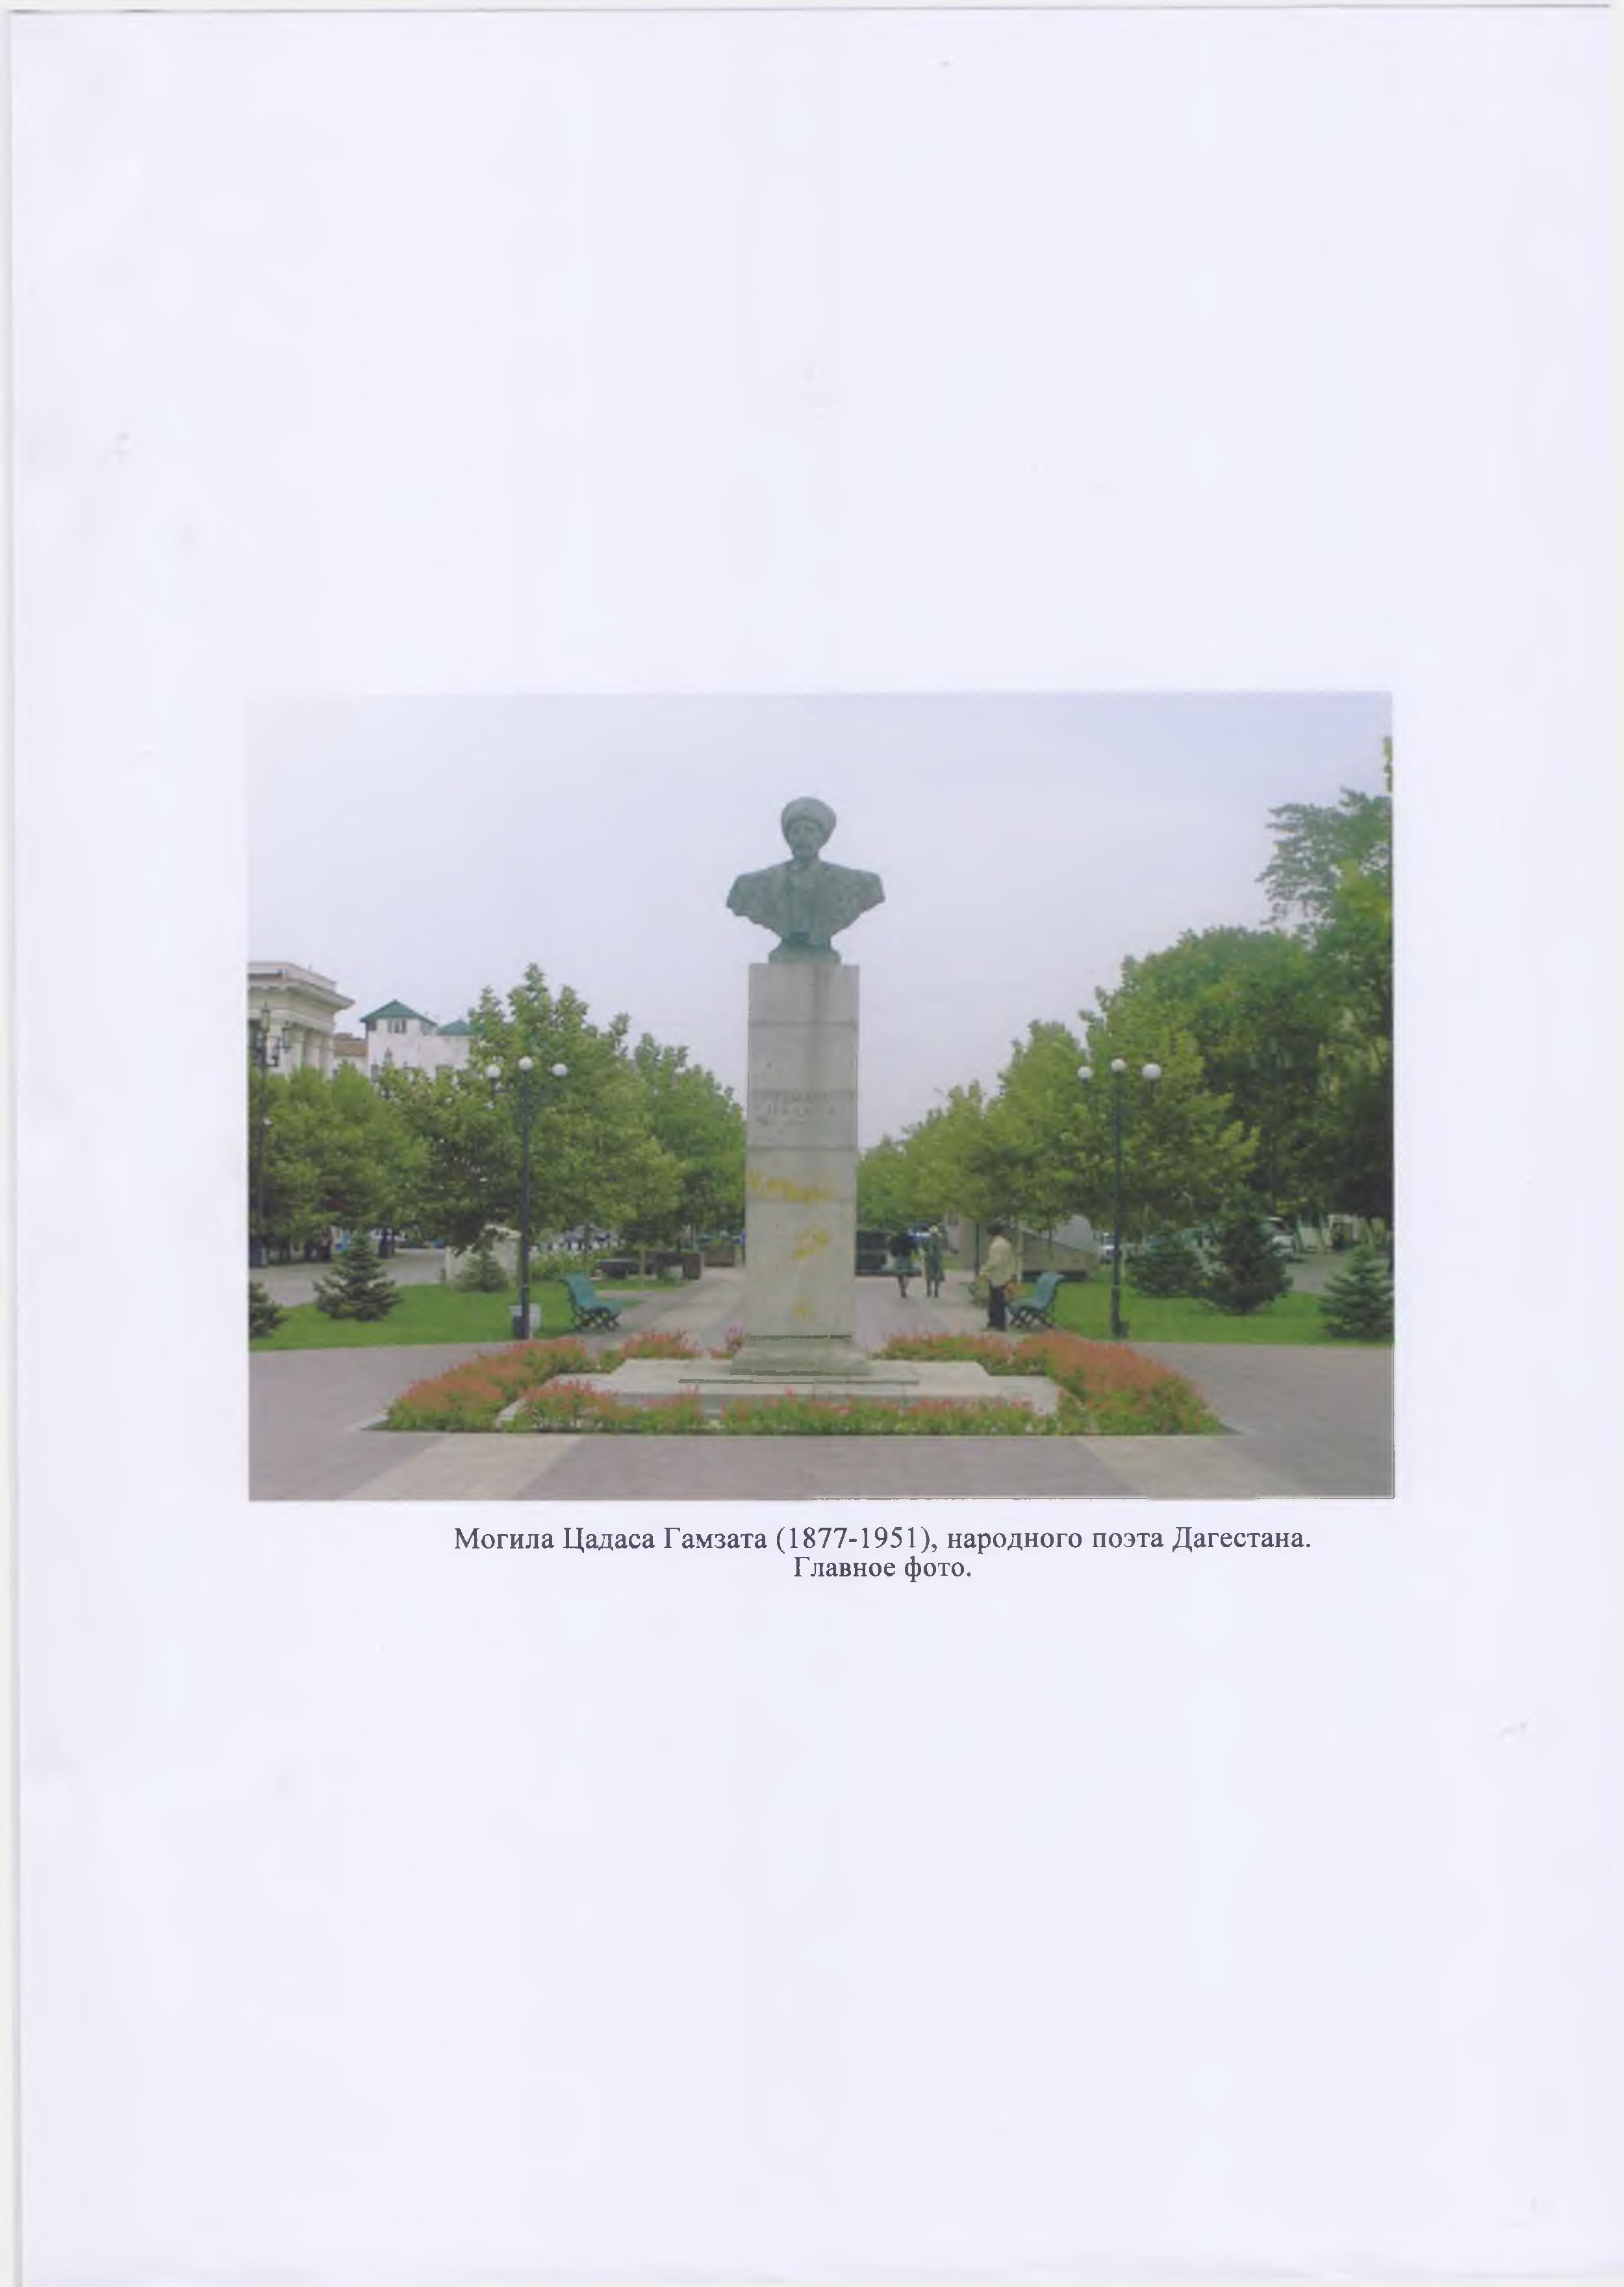 Могила Цадаса Гамзата (1877 - 1951), народного поэта Дагестана